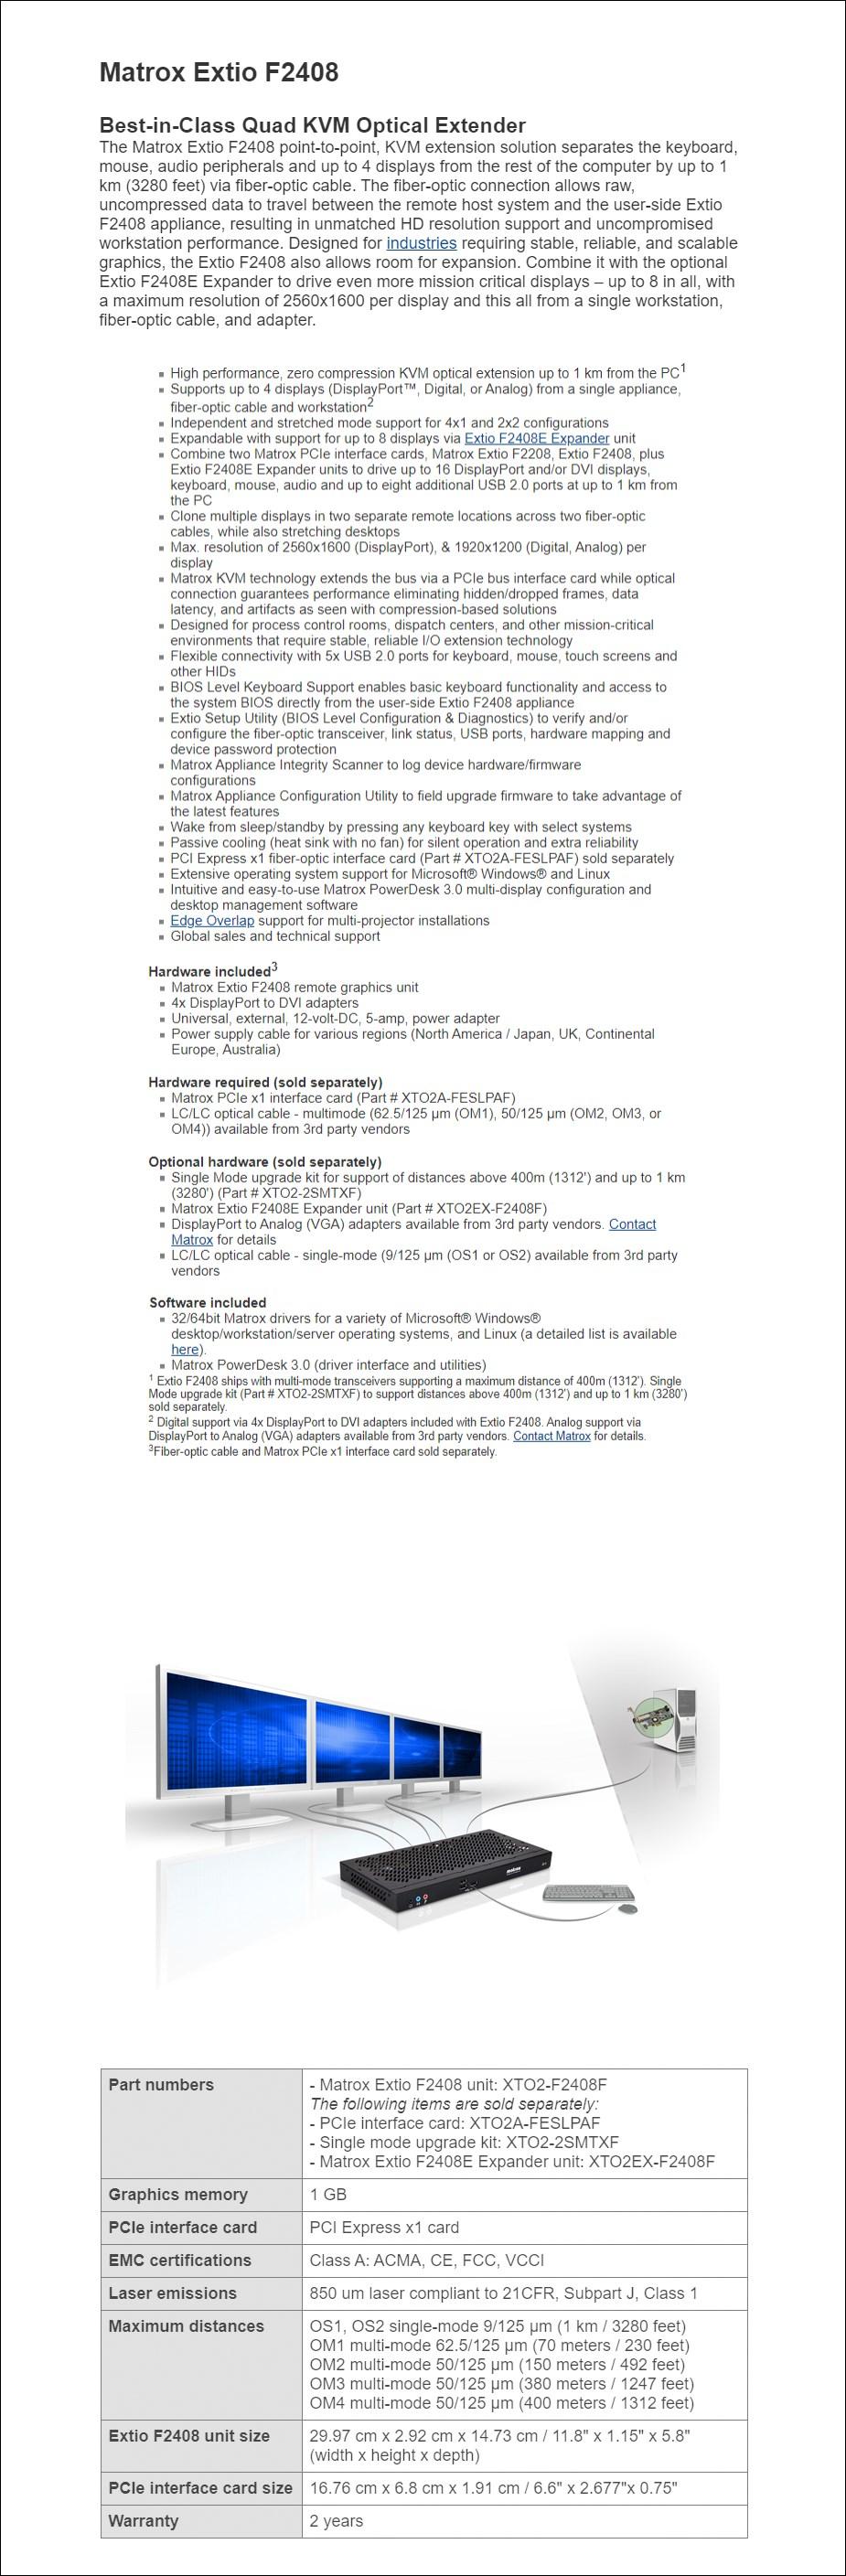 Matrox Extio F2408 Quad-Monitor KVM Extender - Overview 1